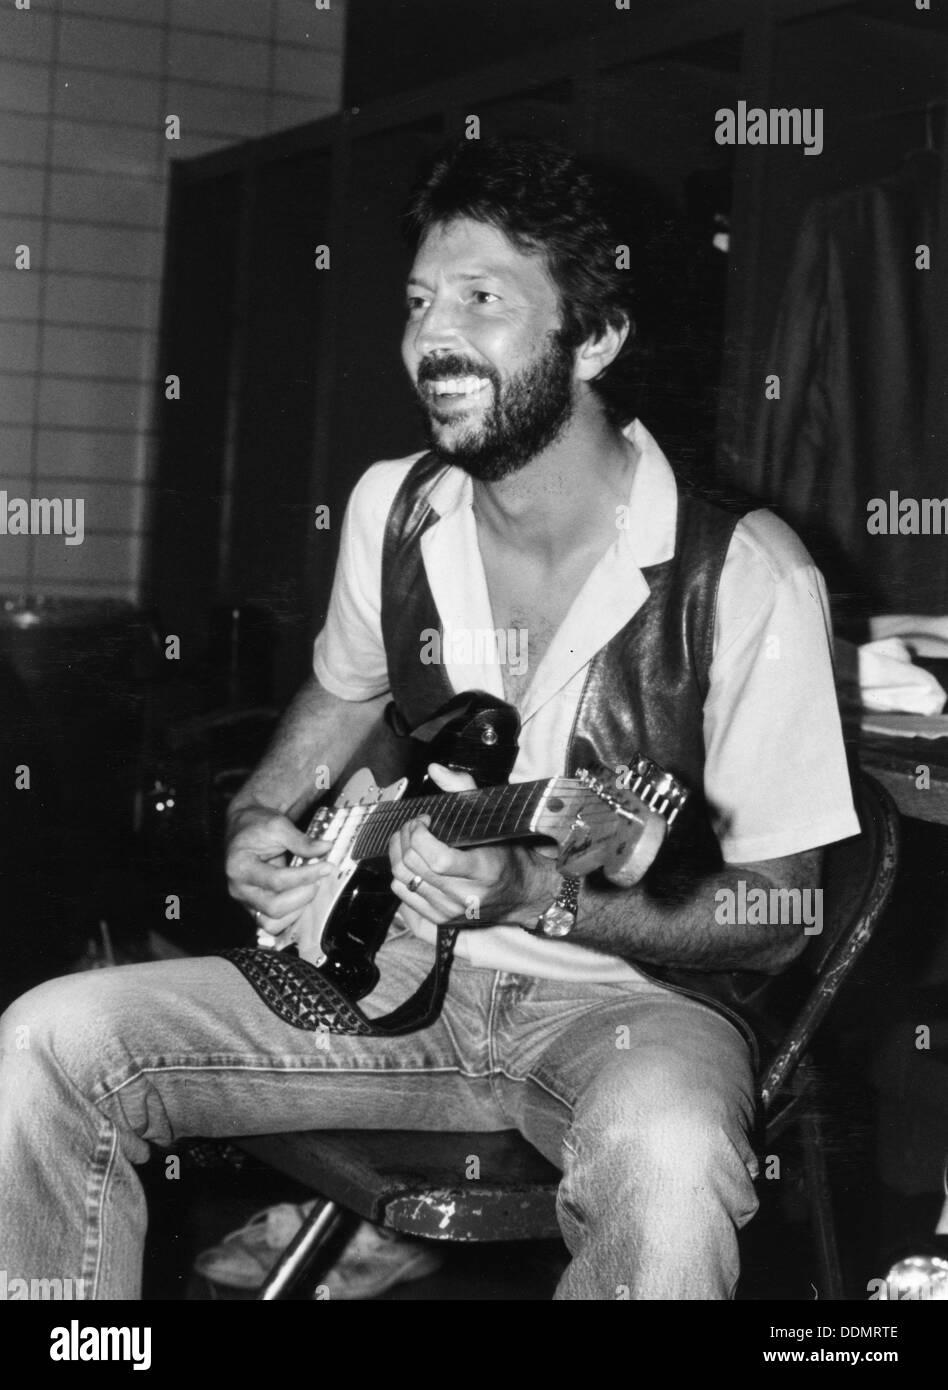 Eric Clapton (1945- ), British musician,1983. - Stock Image